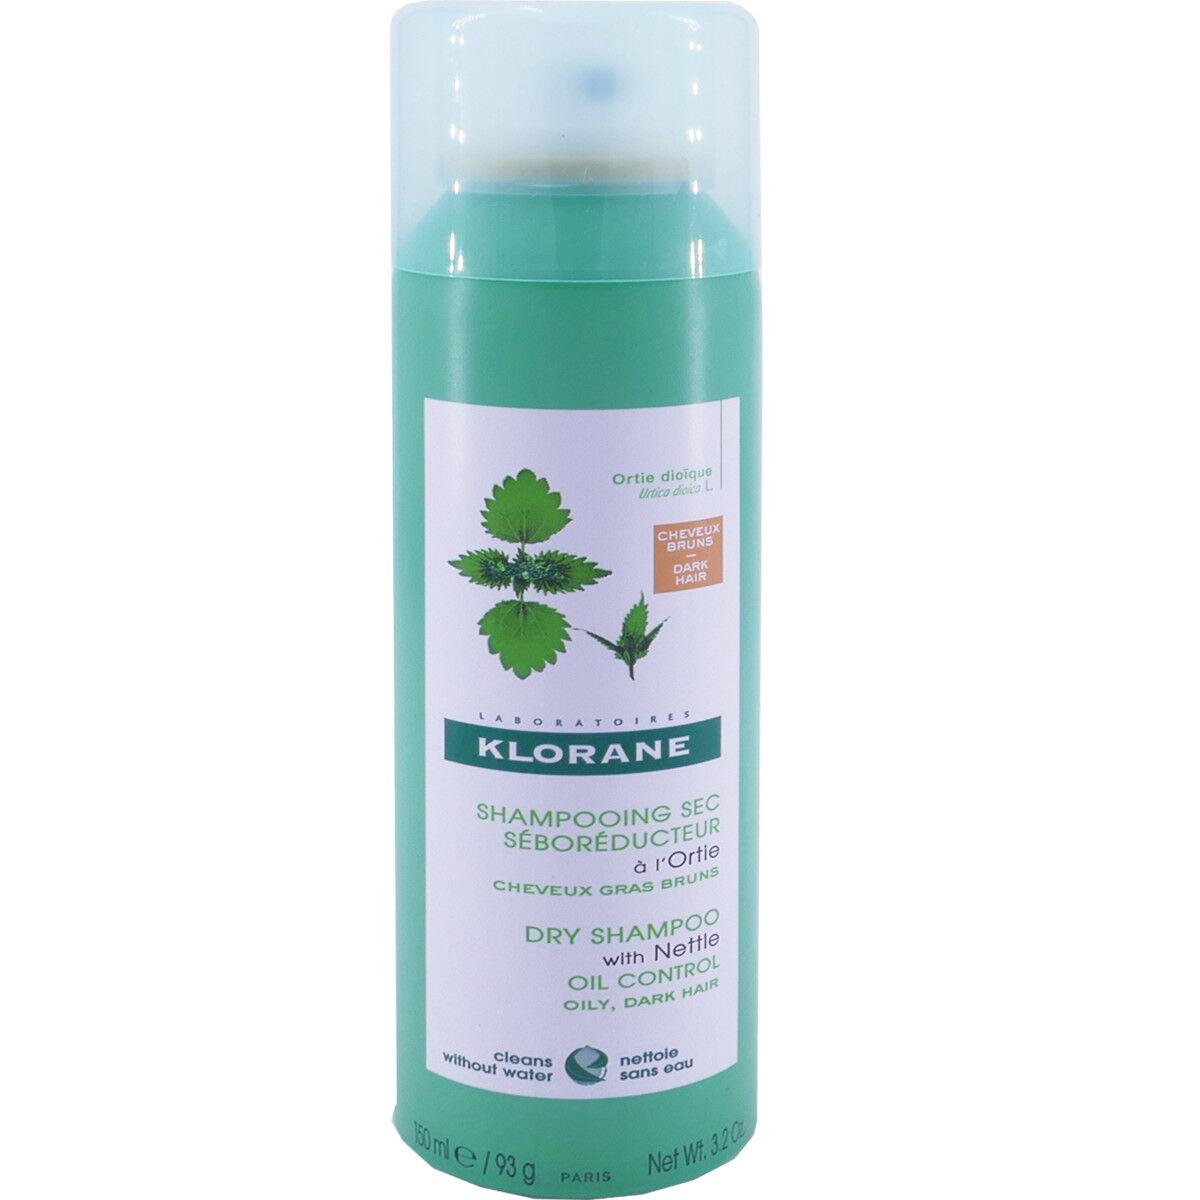 Klorane shampooing sec 150 ml seboreducteur